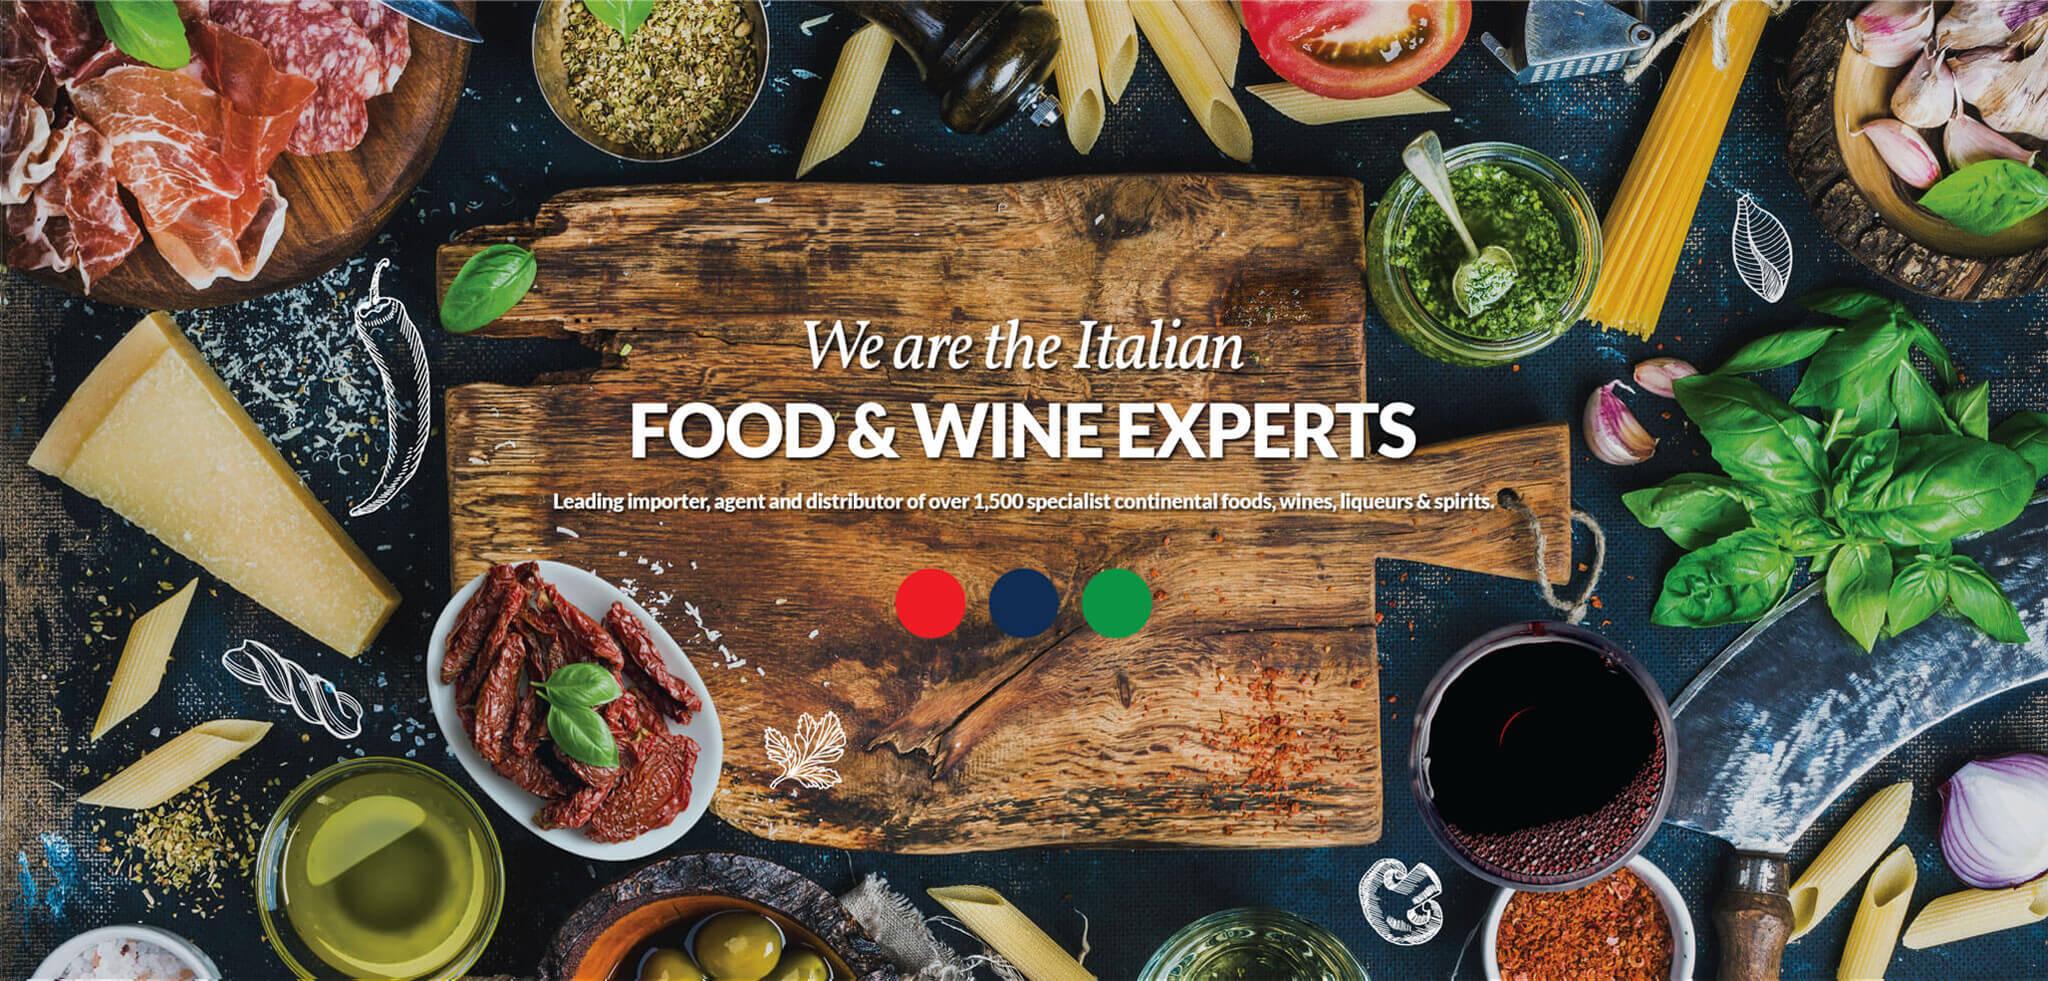 CQS - Continental Quattro Stagioni - Italian Food & Wine